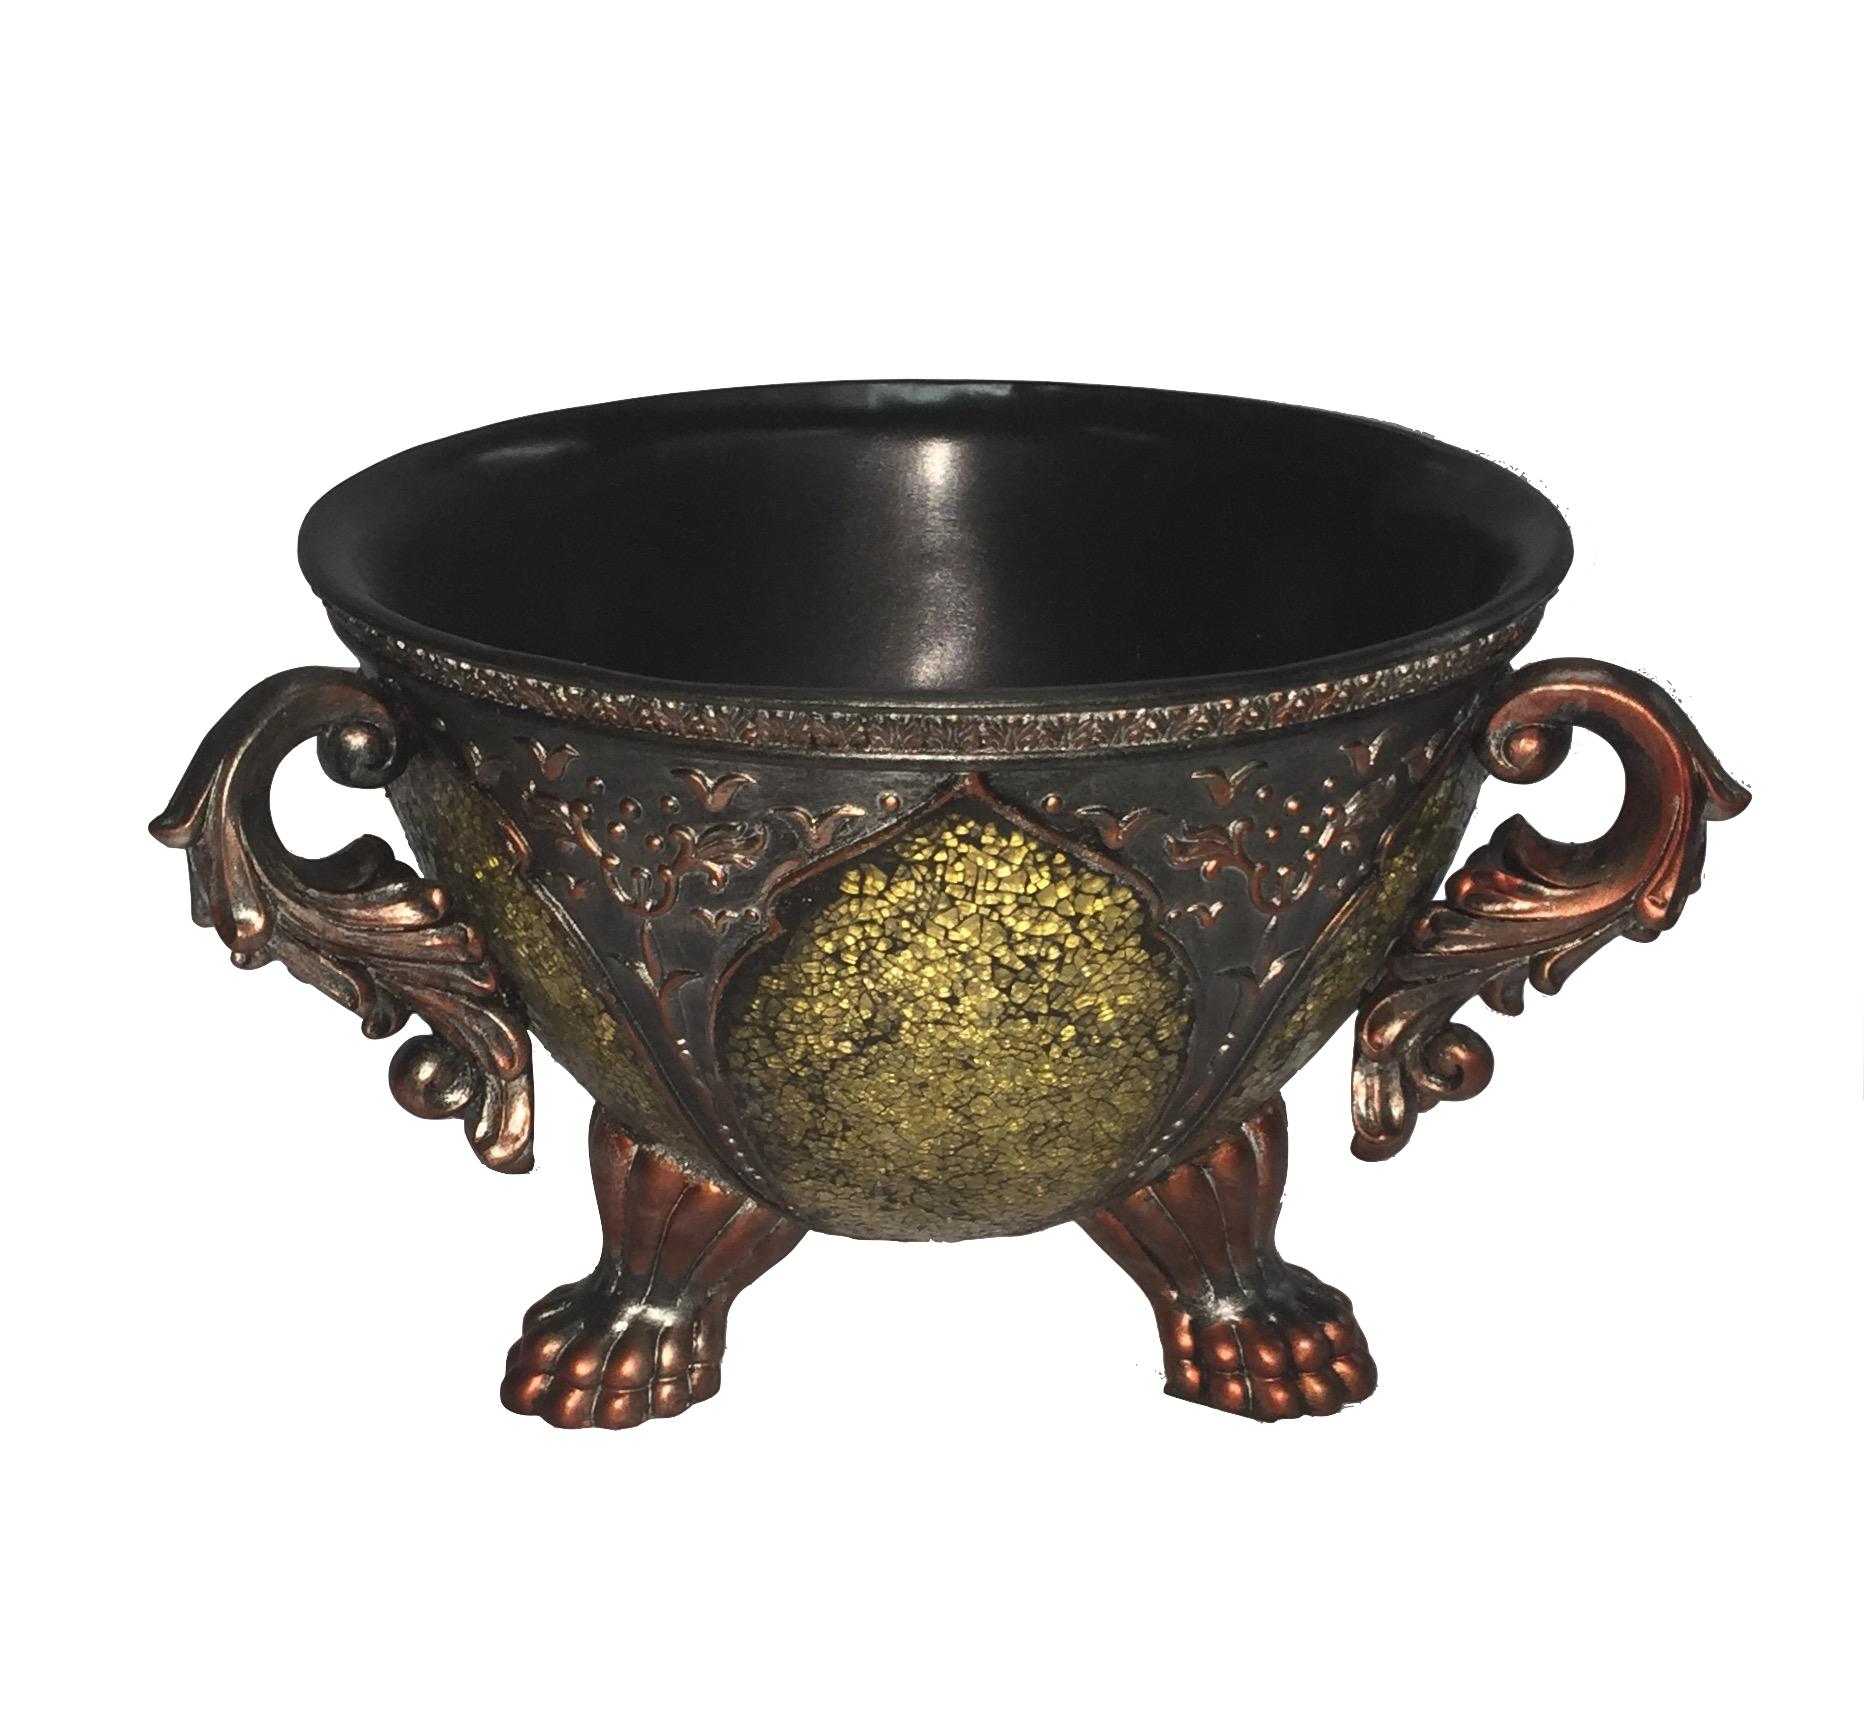 STA-B165 Decorative Bowl